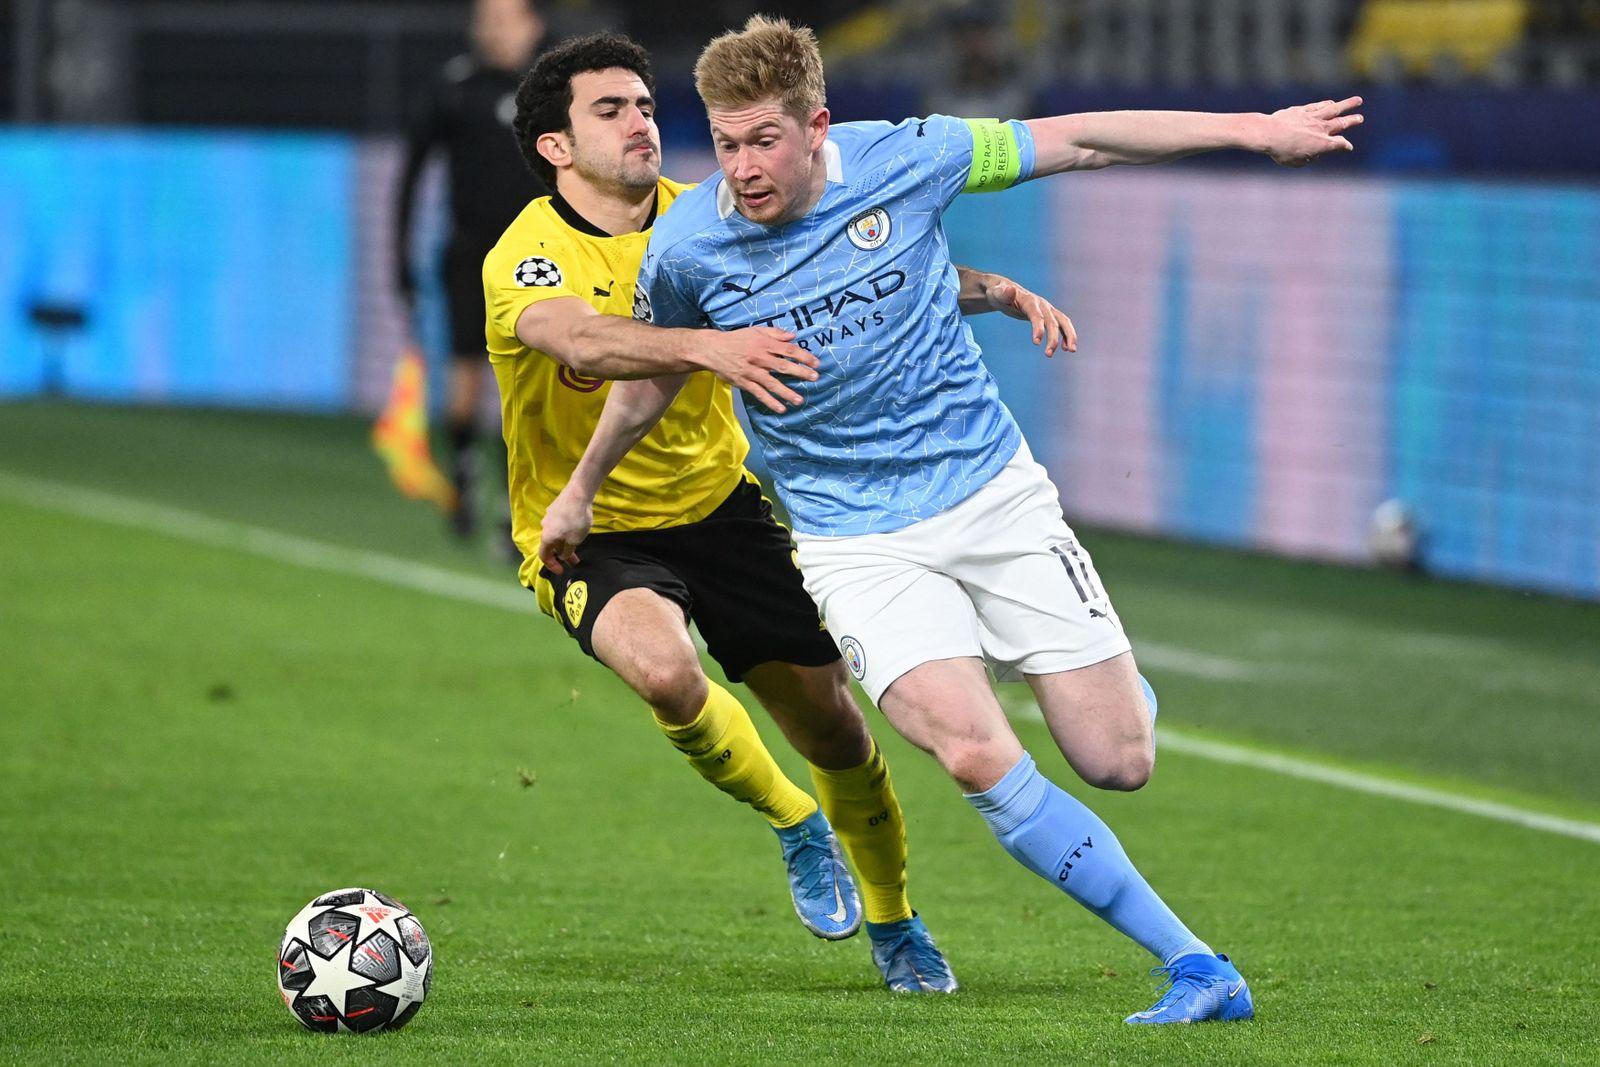 Football: Borussia Dortmund v Manchester City in Champions League quarter final second leg